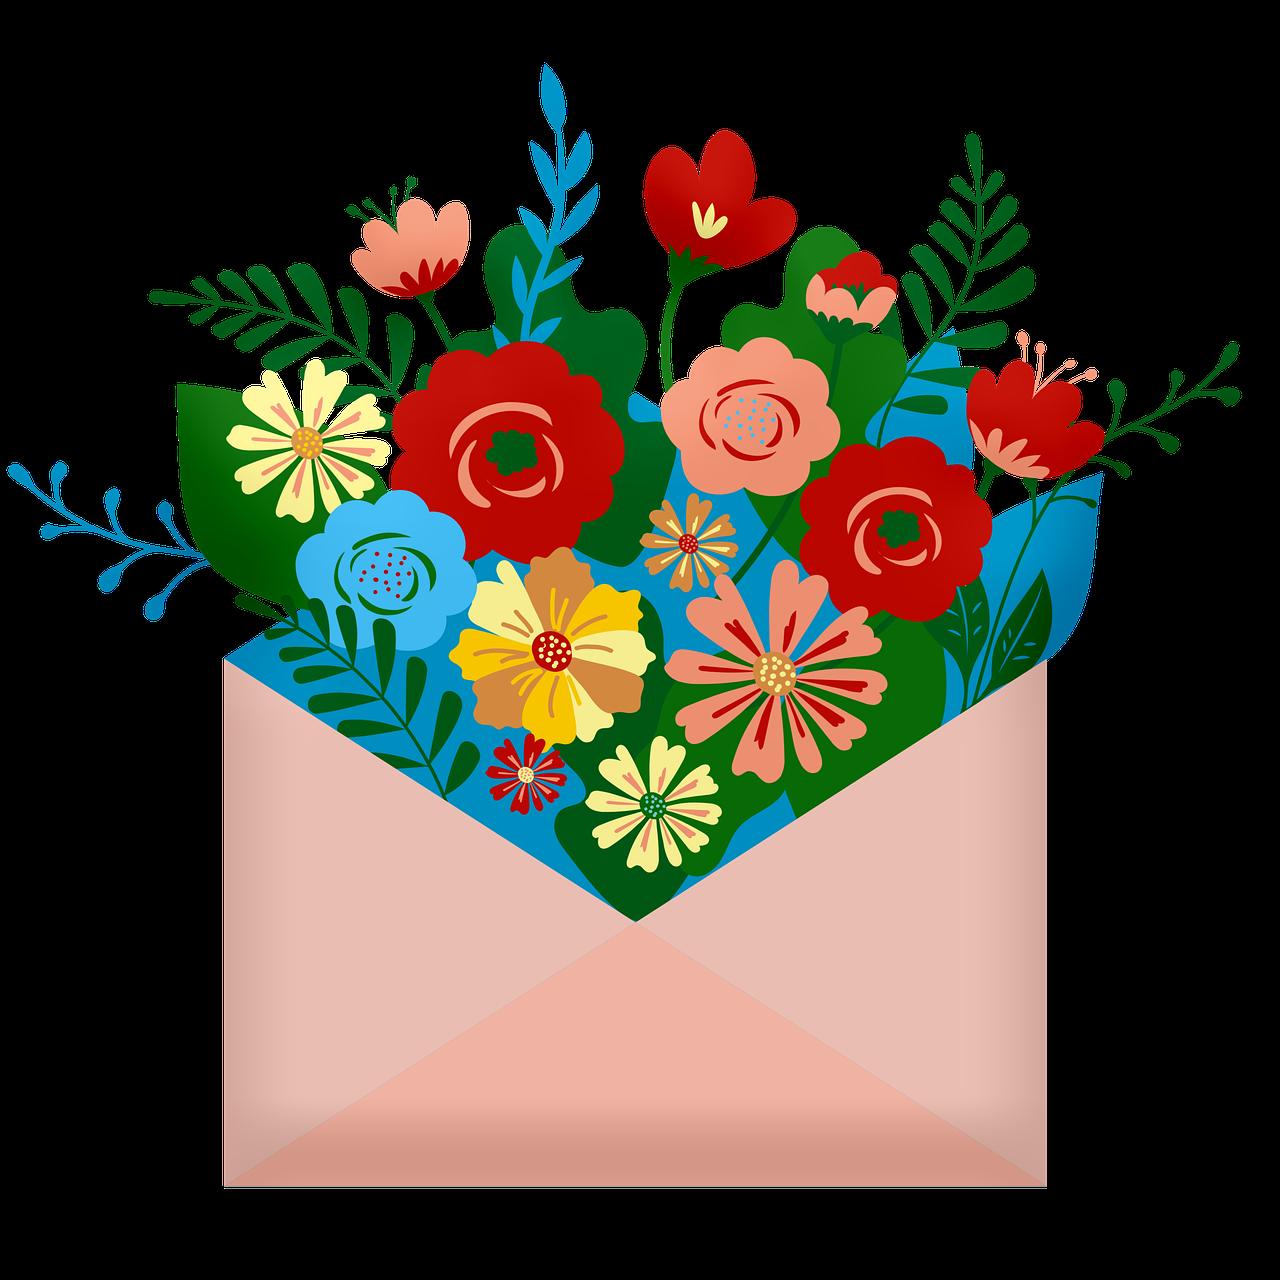 flower-bouquet-5312090_1280